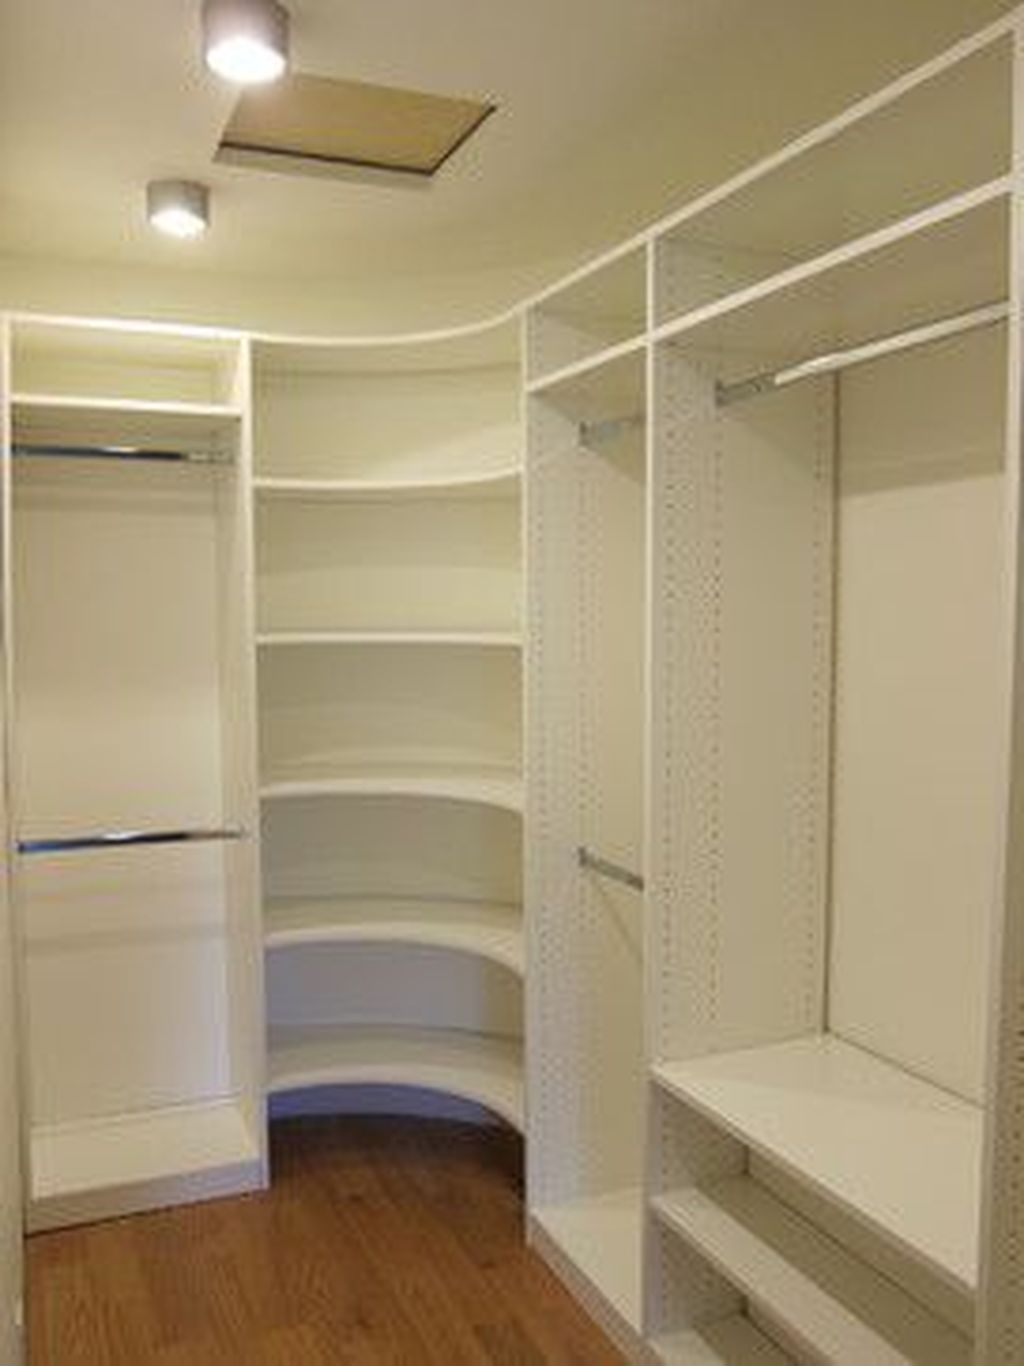 48 Adorable Master Bedroom Closet Designs Ideas